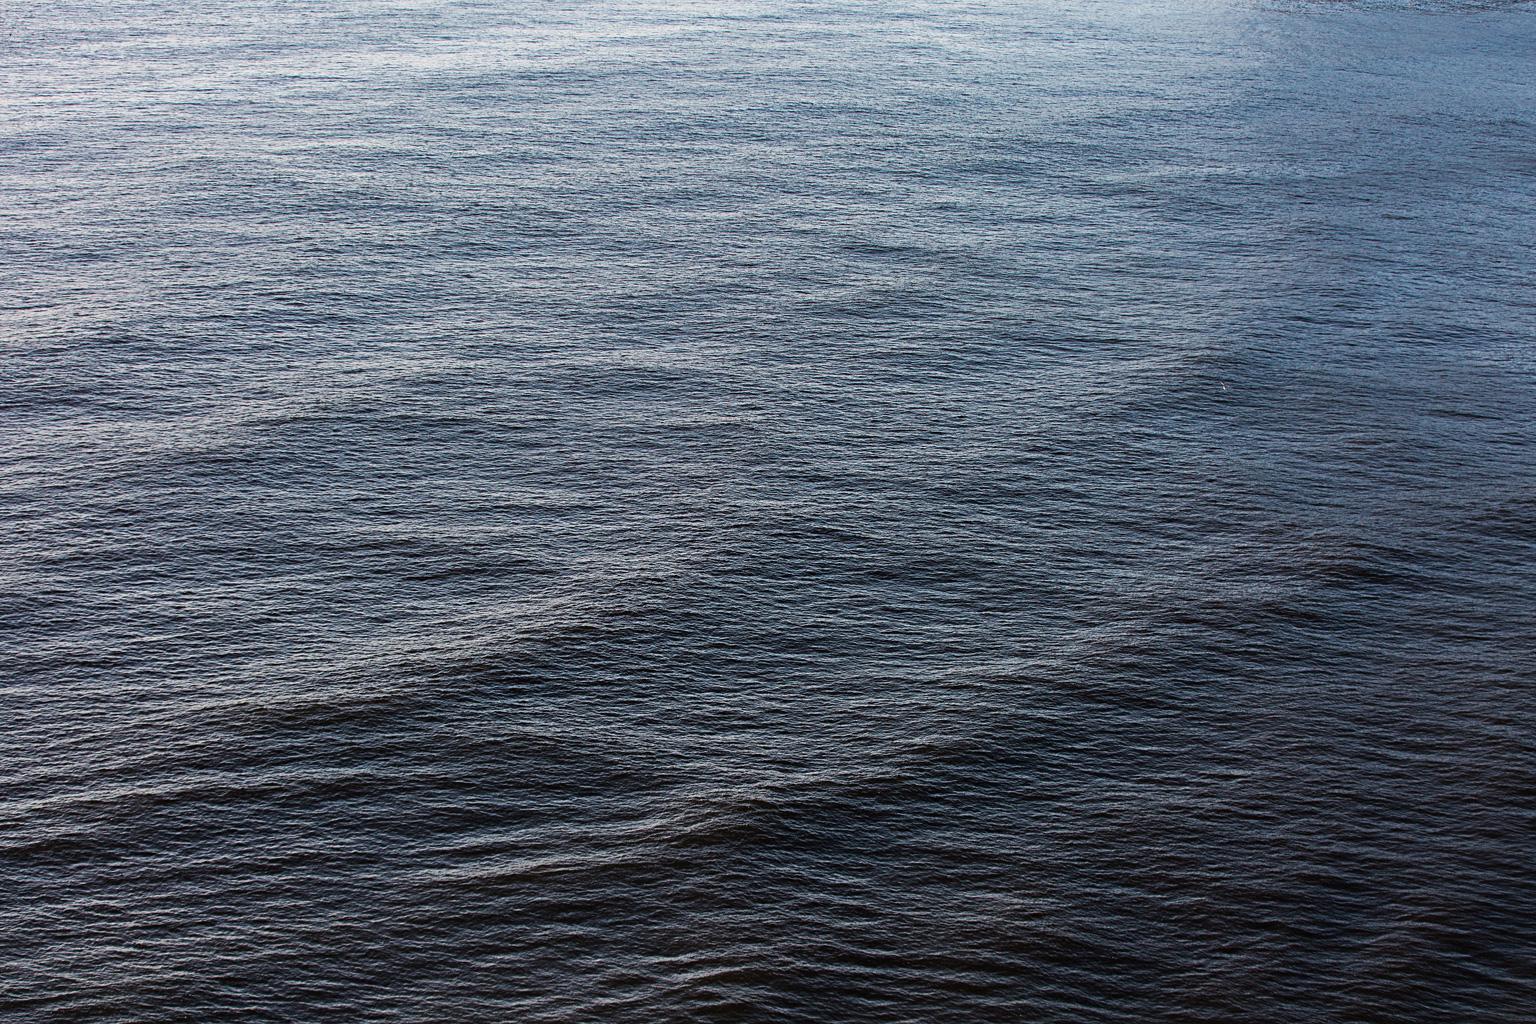 CindyGiovagnoli_Crater_Lake_National_Park_Cape_Perpetua_Heceta_Head_lighthouse_Pacific_Ocean_Cannon_Beach_haystack_Oregon_coast-015.jpg